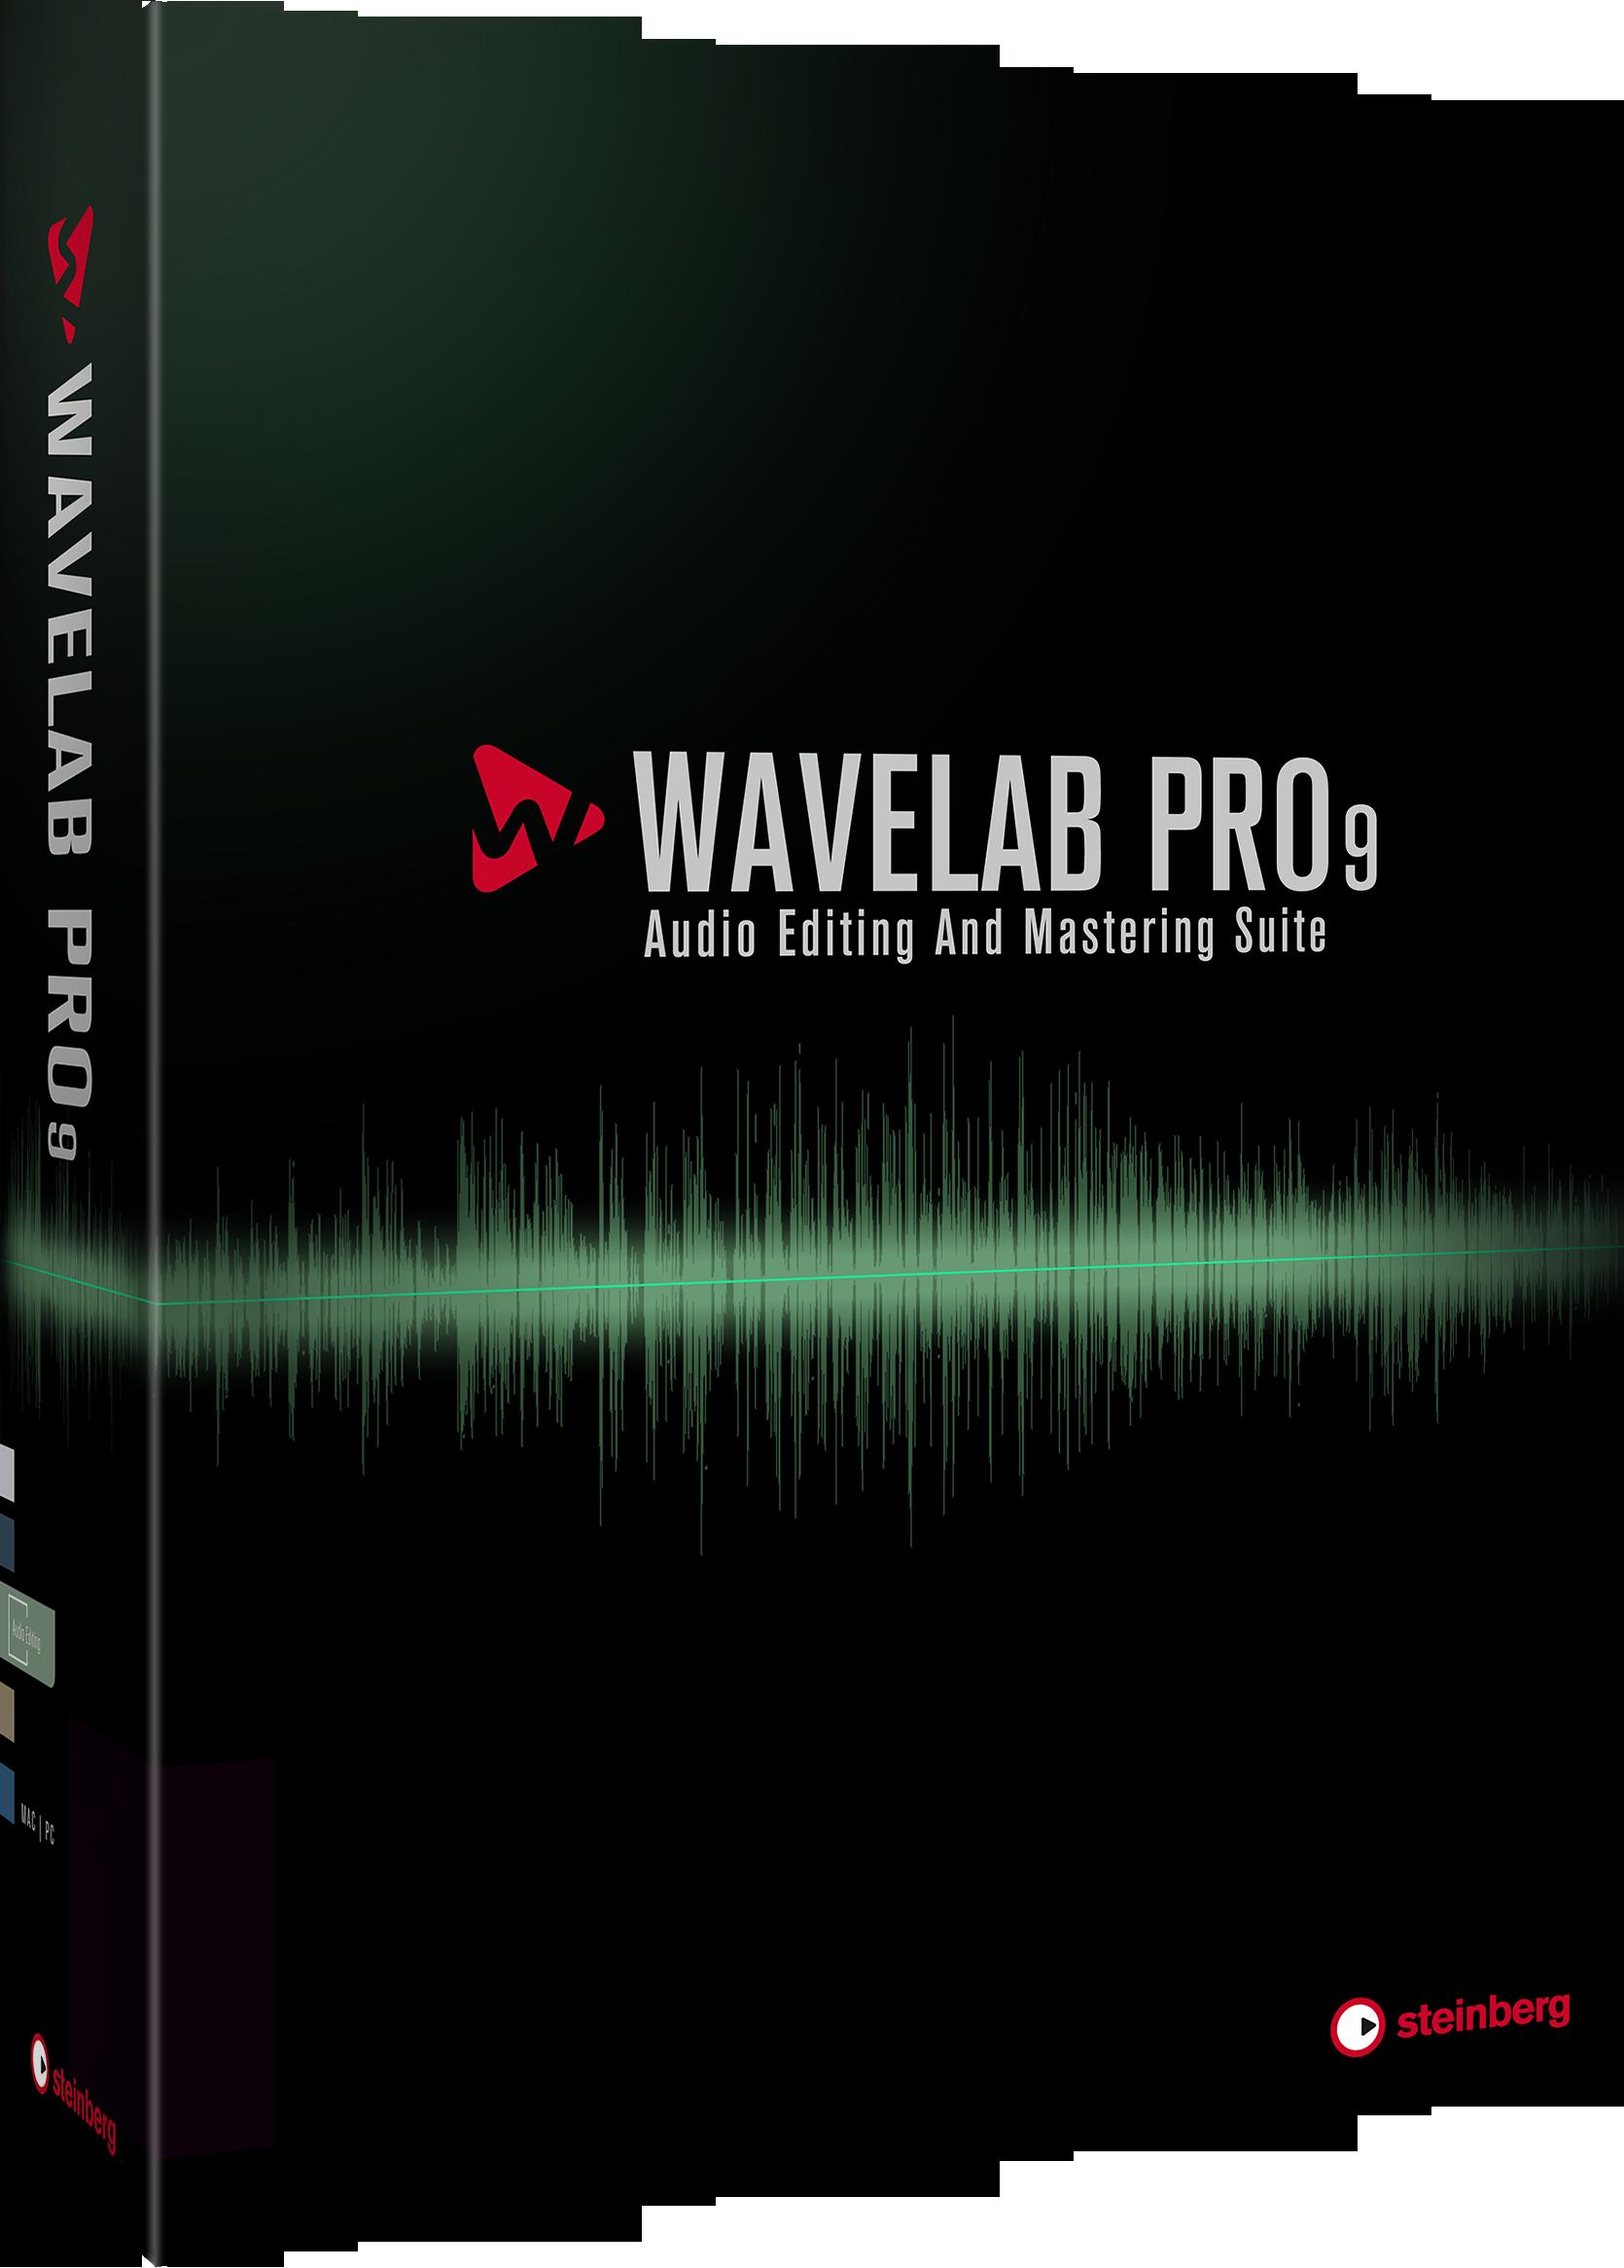 Steinberg Wavelab 9 EDU